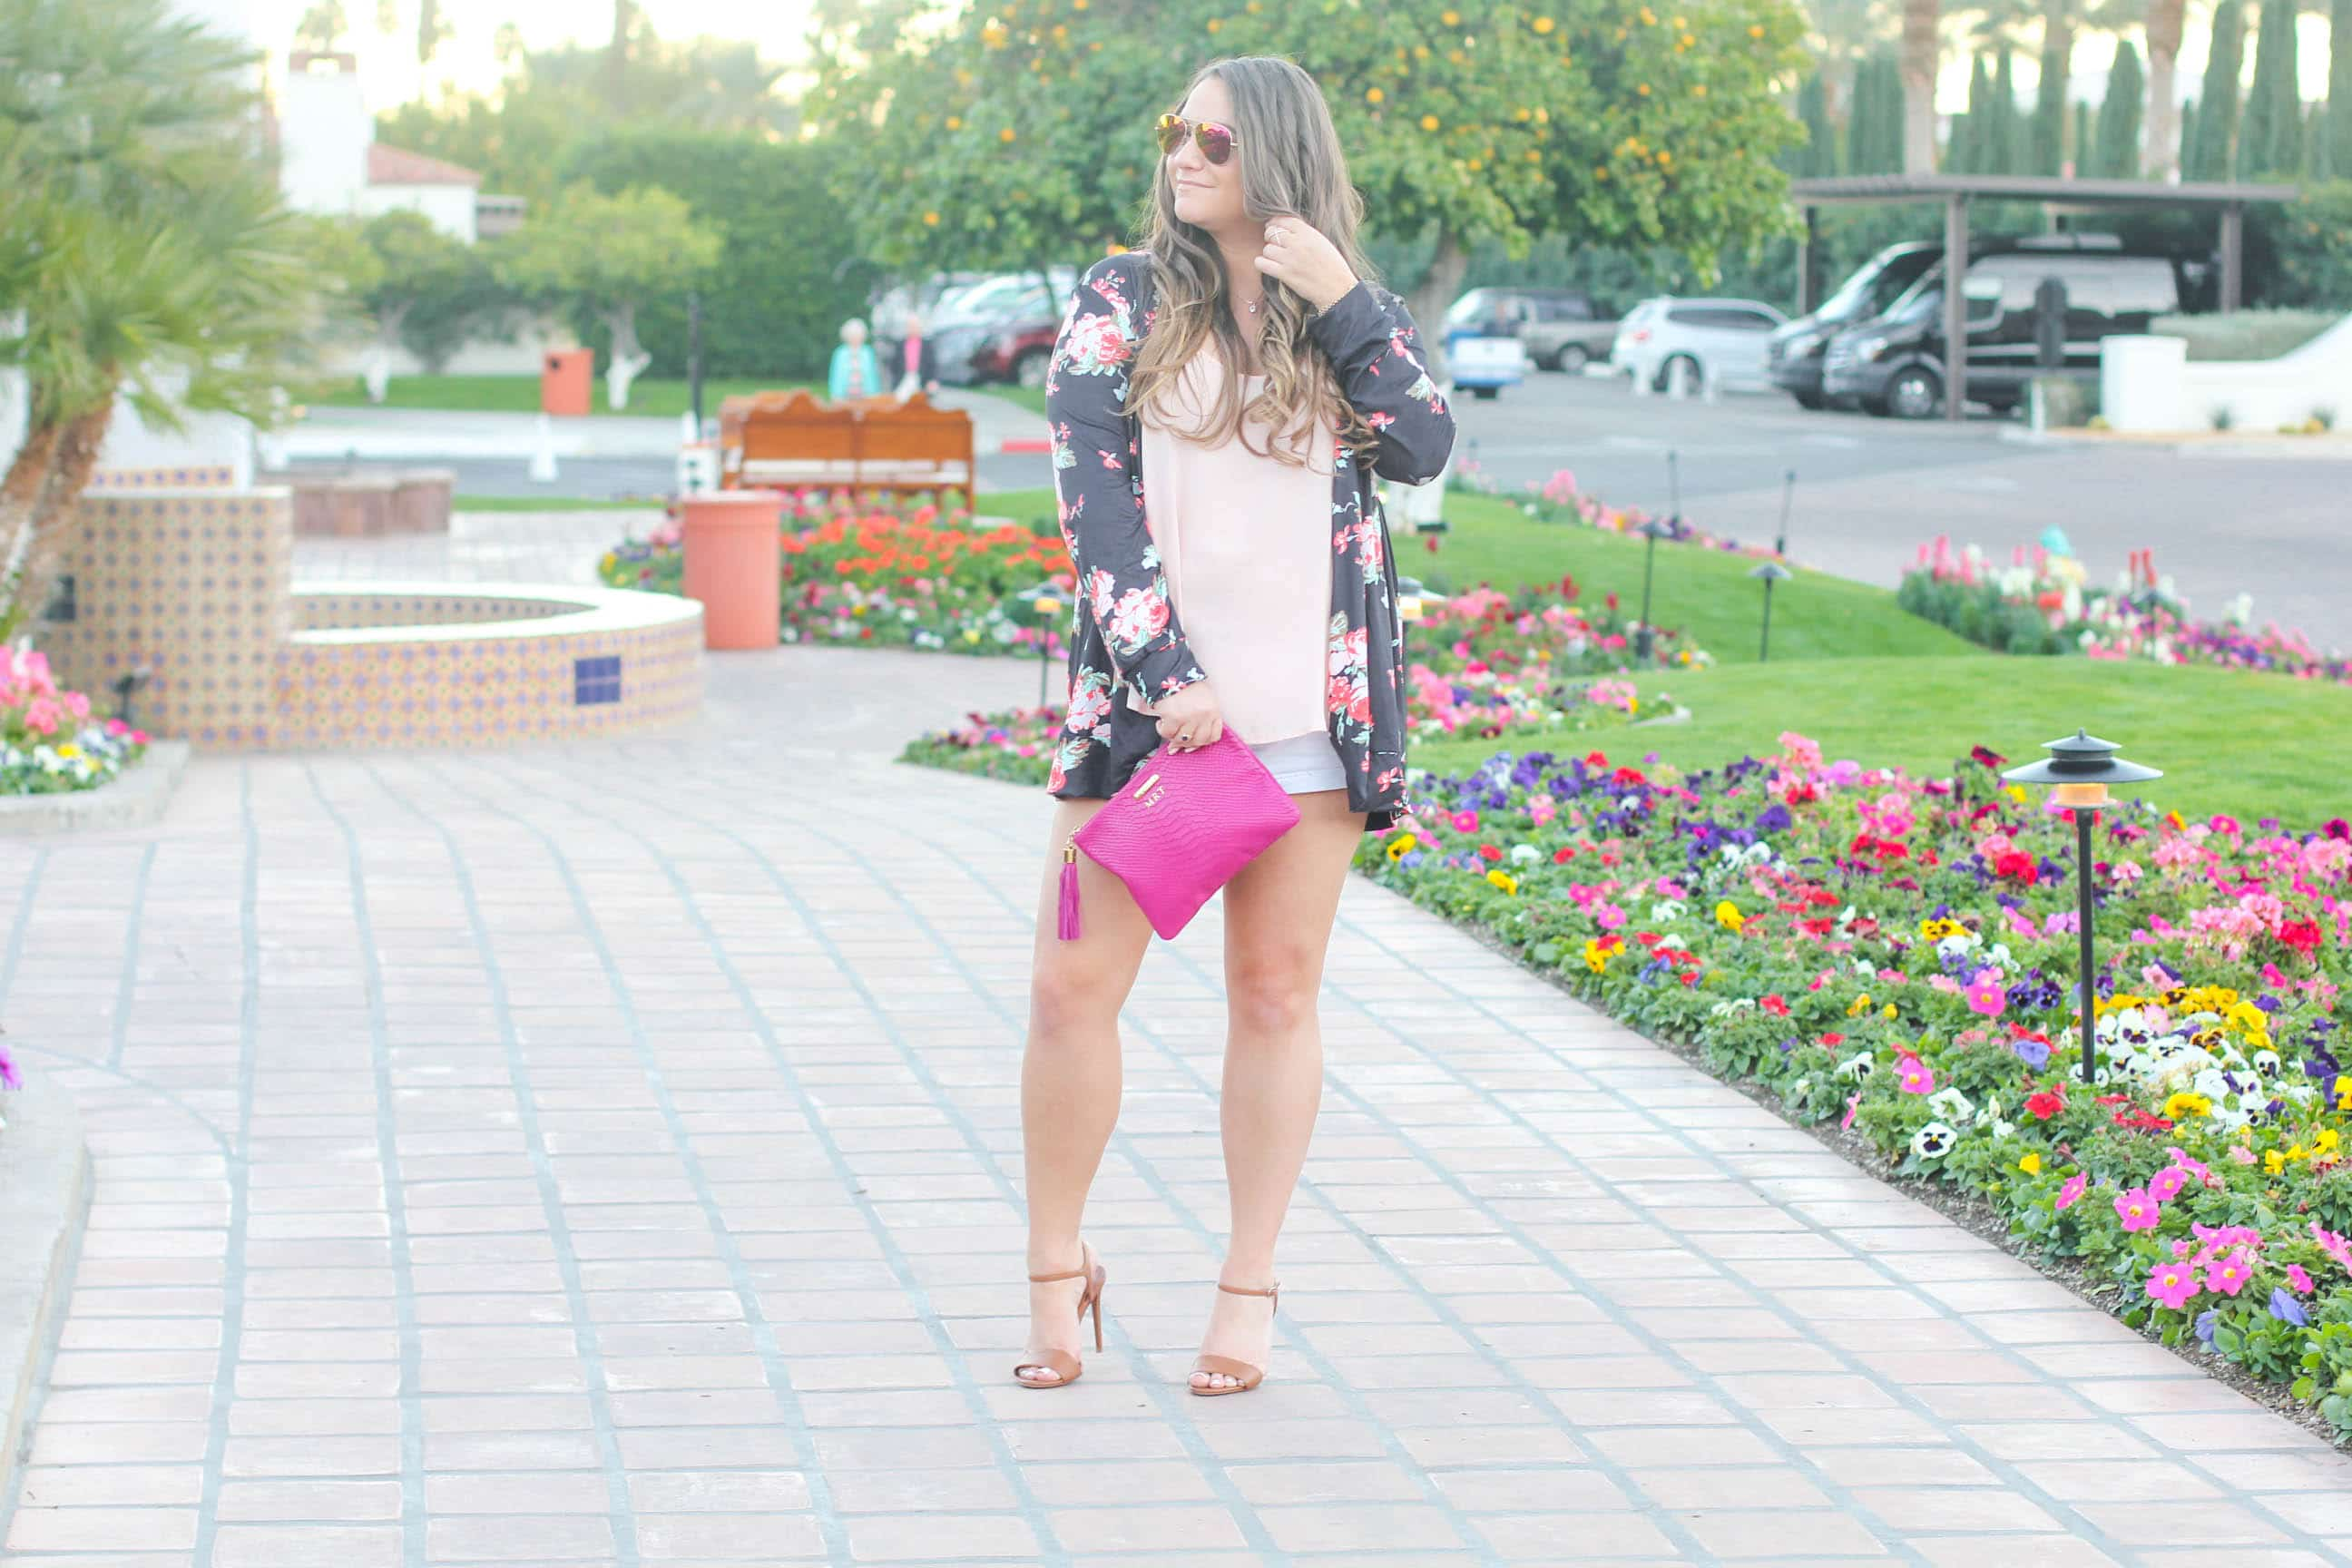 missyonmadison, missyonmadison instagram, fashion blogger, la blogger, style blogger, style diaries, gigi ny, gigi new york, gigi ny uber clutch, gigi ny magenta clutch, ralph lauren, ankle strap heels, tan ankle strap heels, tan ralph lauren sandals, ralph lauren ankle strap sandals, floral kimono, navy floral kimono, melissa tierney, raybans, la quinta resort, palm springs, palm springs style, la quinta resort and spa, ootd, summer style, summer 2017 style,